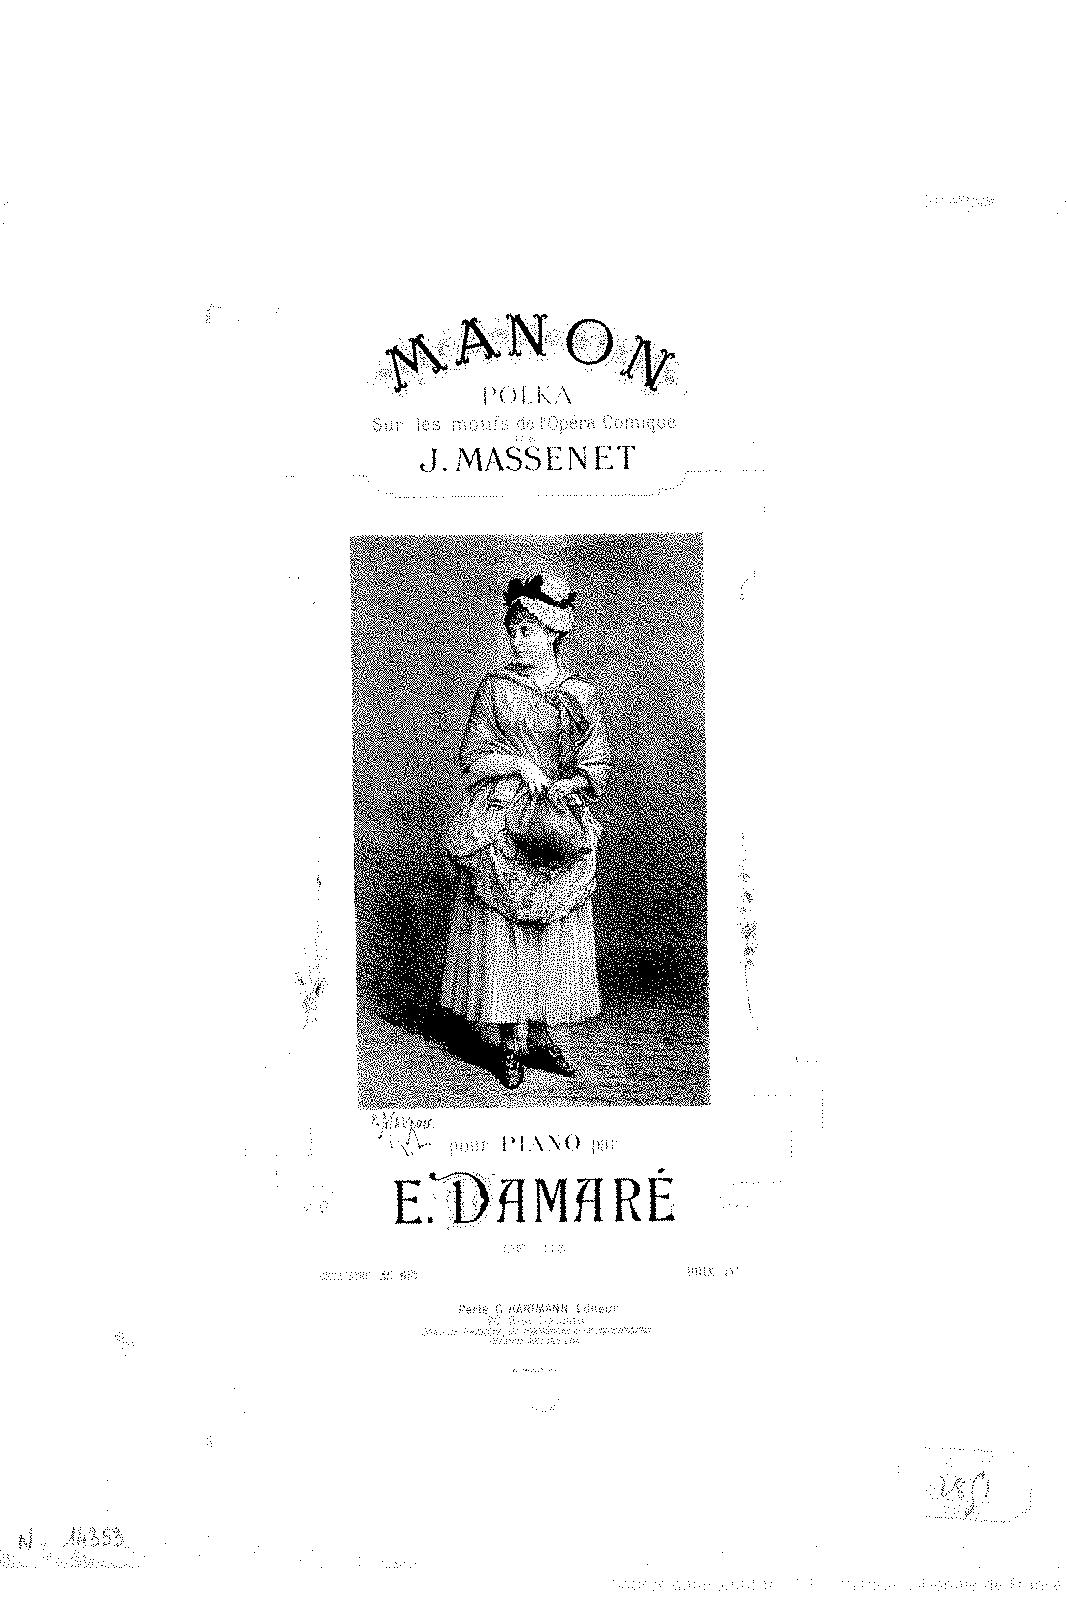 Polka sur 'Manon', Op 115 (Damaré, Eugène) - IMSLP/Petrucci Music